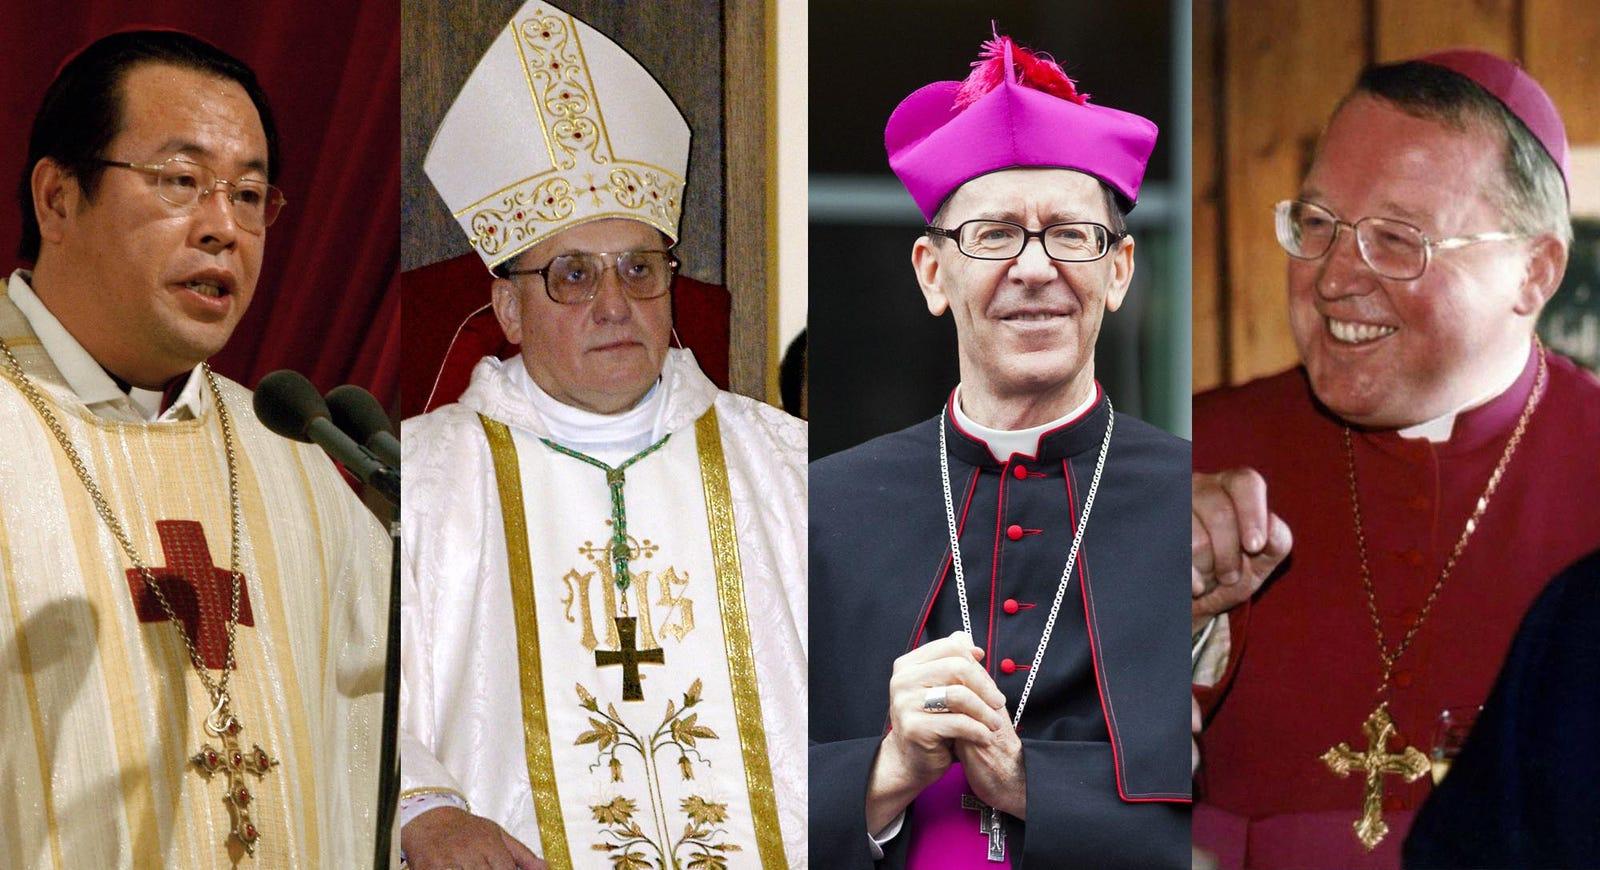 Vatican Dispatches Elite Team Of Bishops To Sabotage Contraceptive Manufacturer